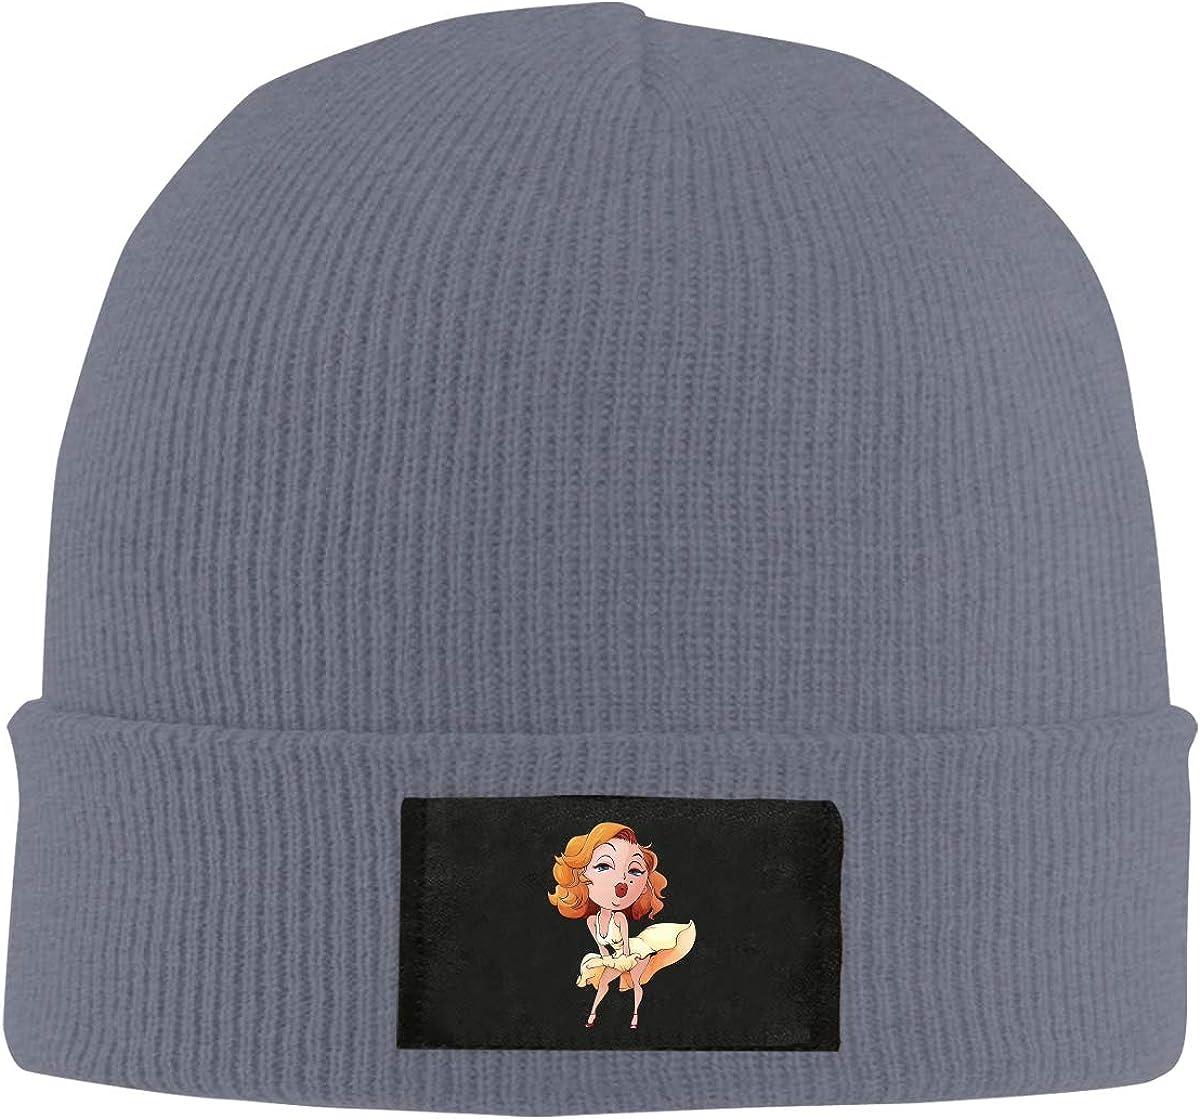 Unisex 3D Print Marilyn Monroe Skull Cap Knit Wool Beanie Hat Stretchy Solid Daily Wear